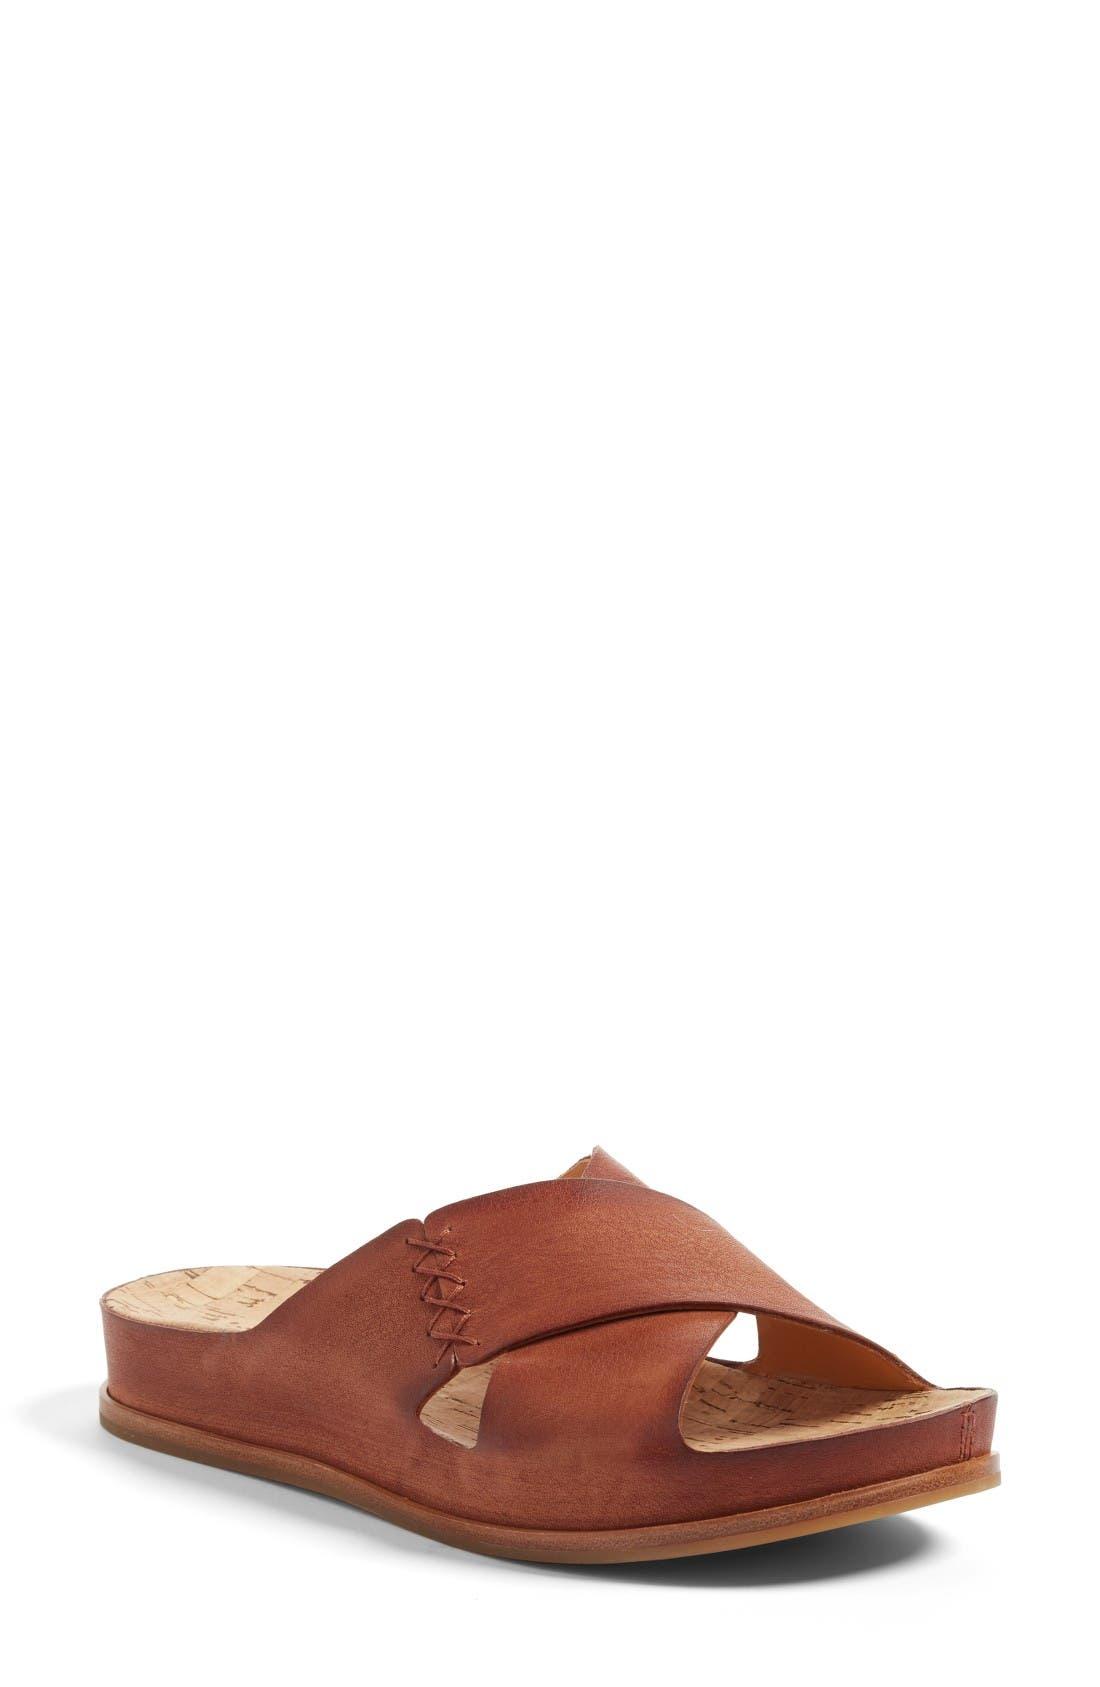 Main Image - Kork-Ease® Amboy Slide Sandal (Women)